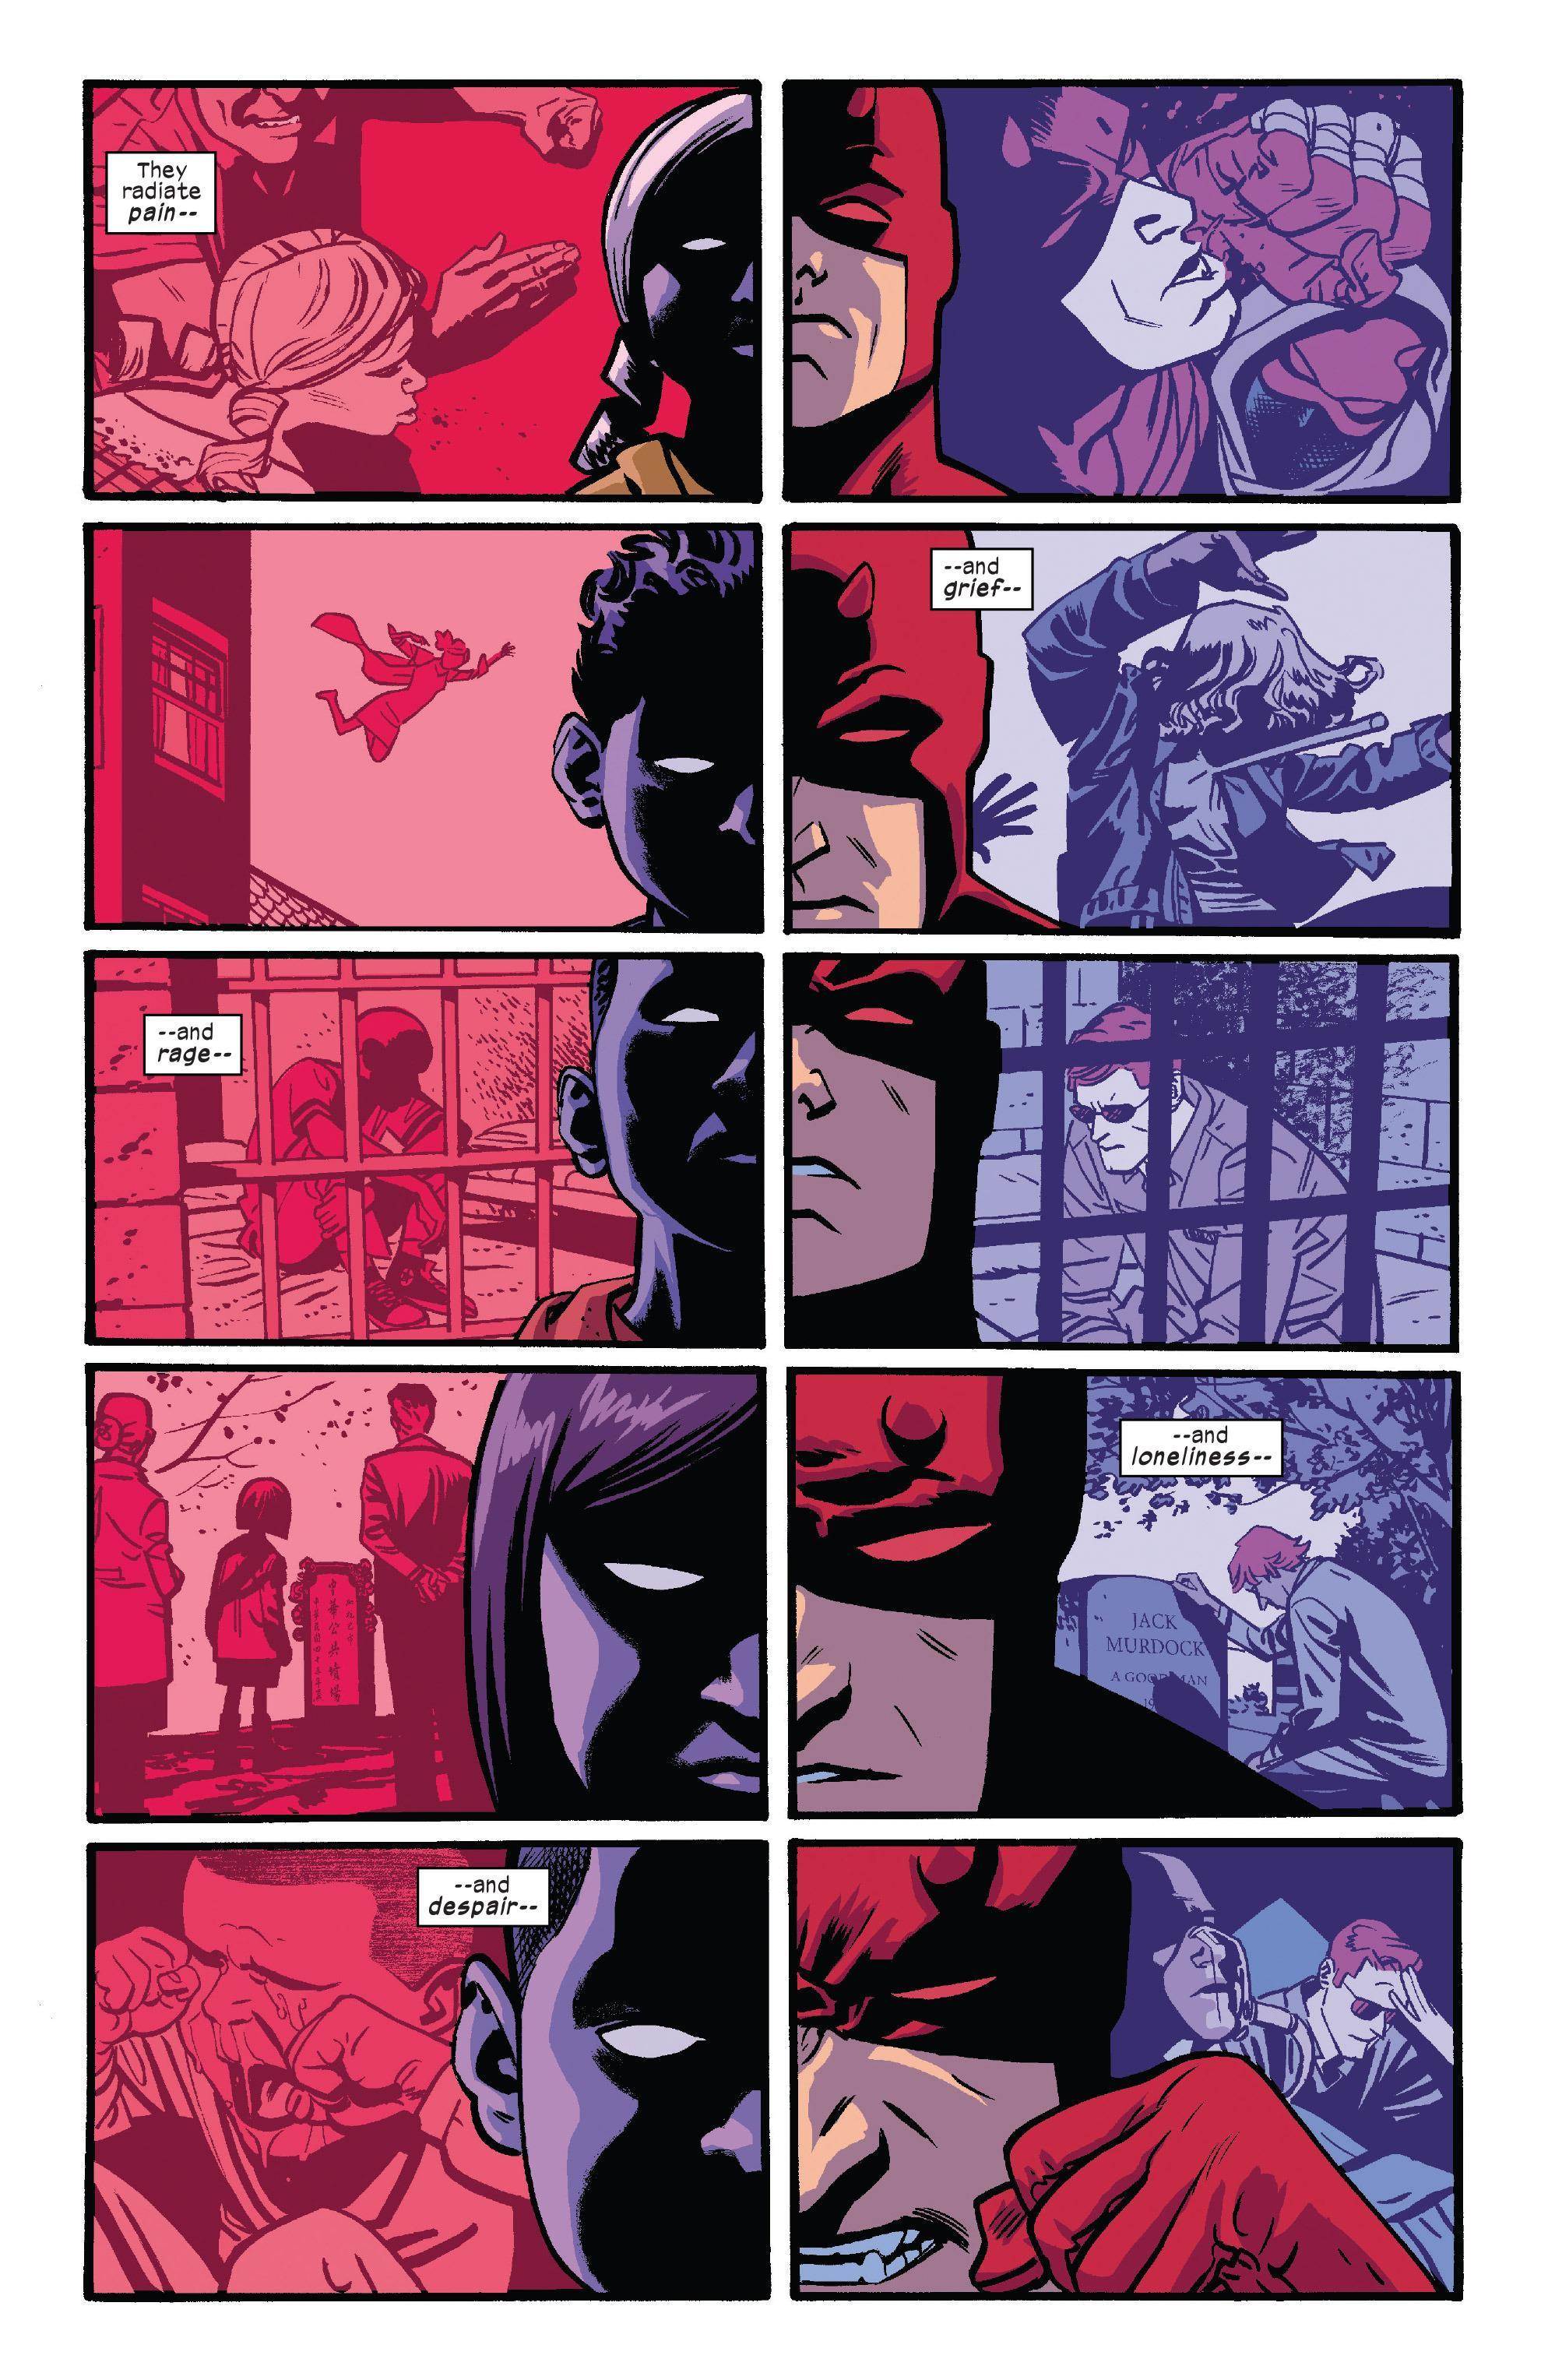 Daredevil by Mark Waid & Chris Samnee V4 review